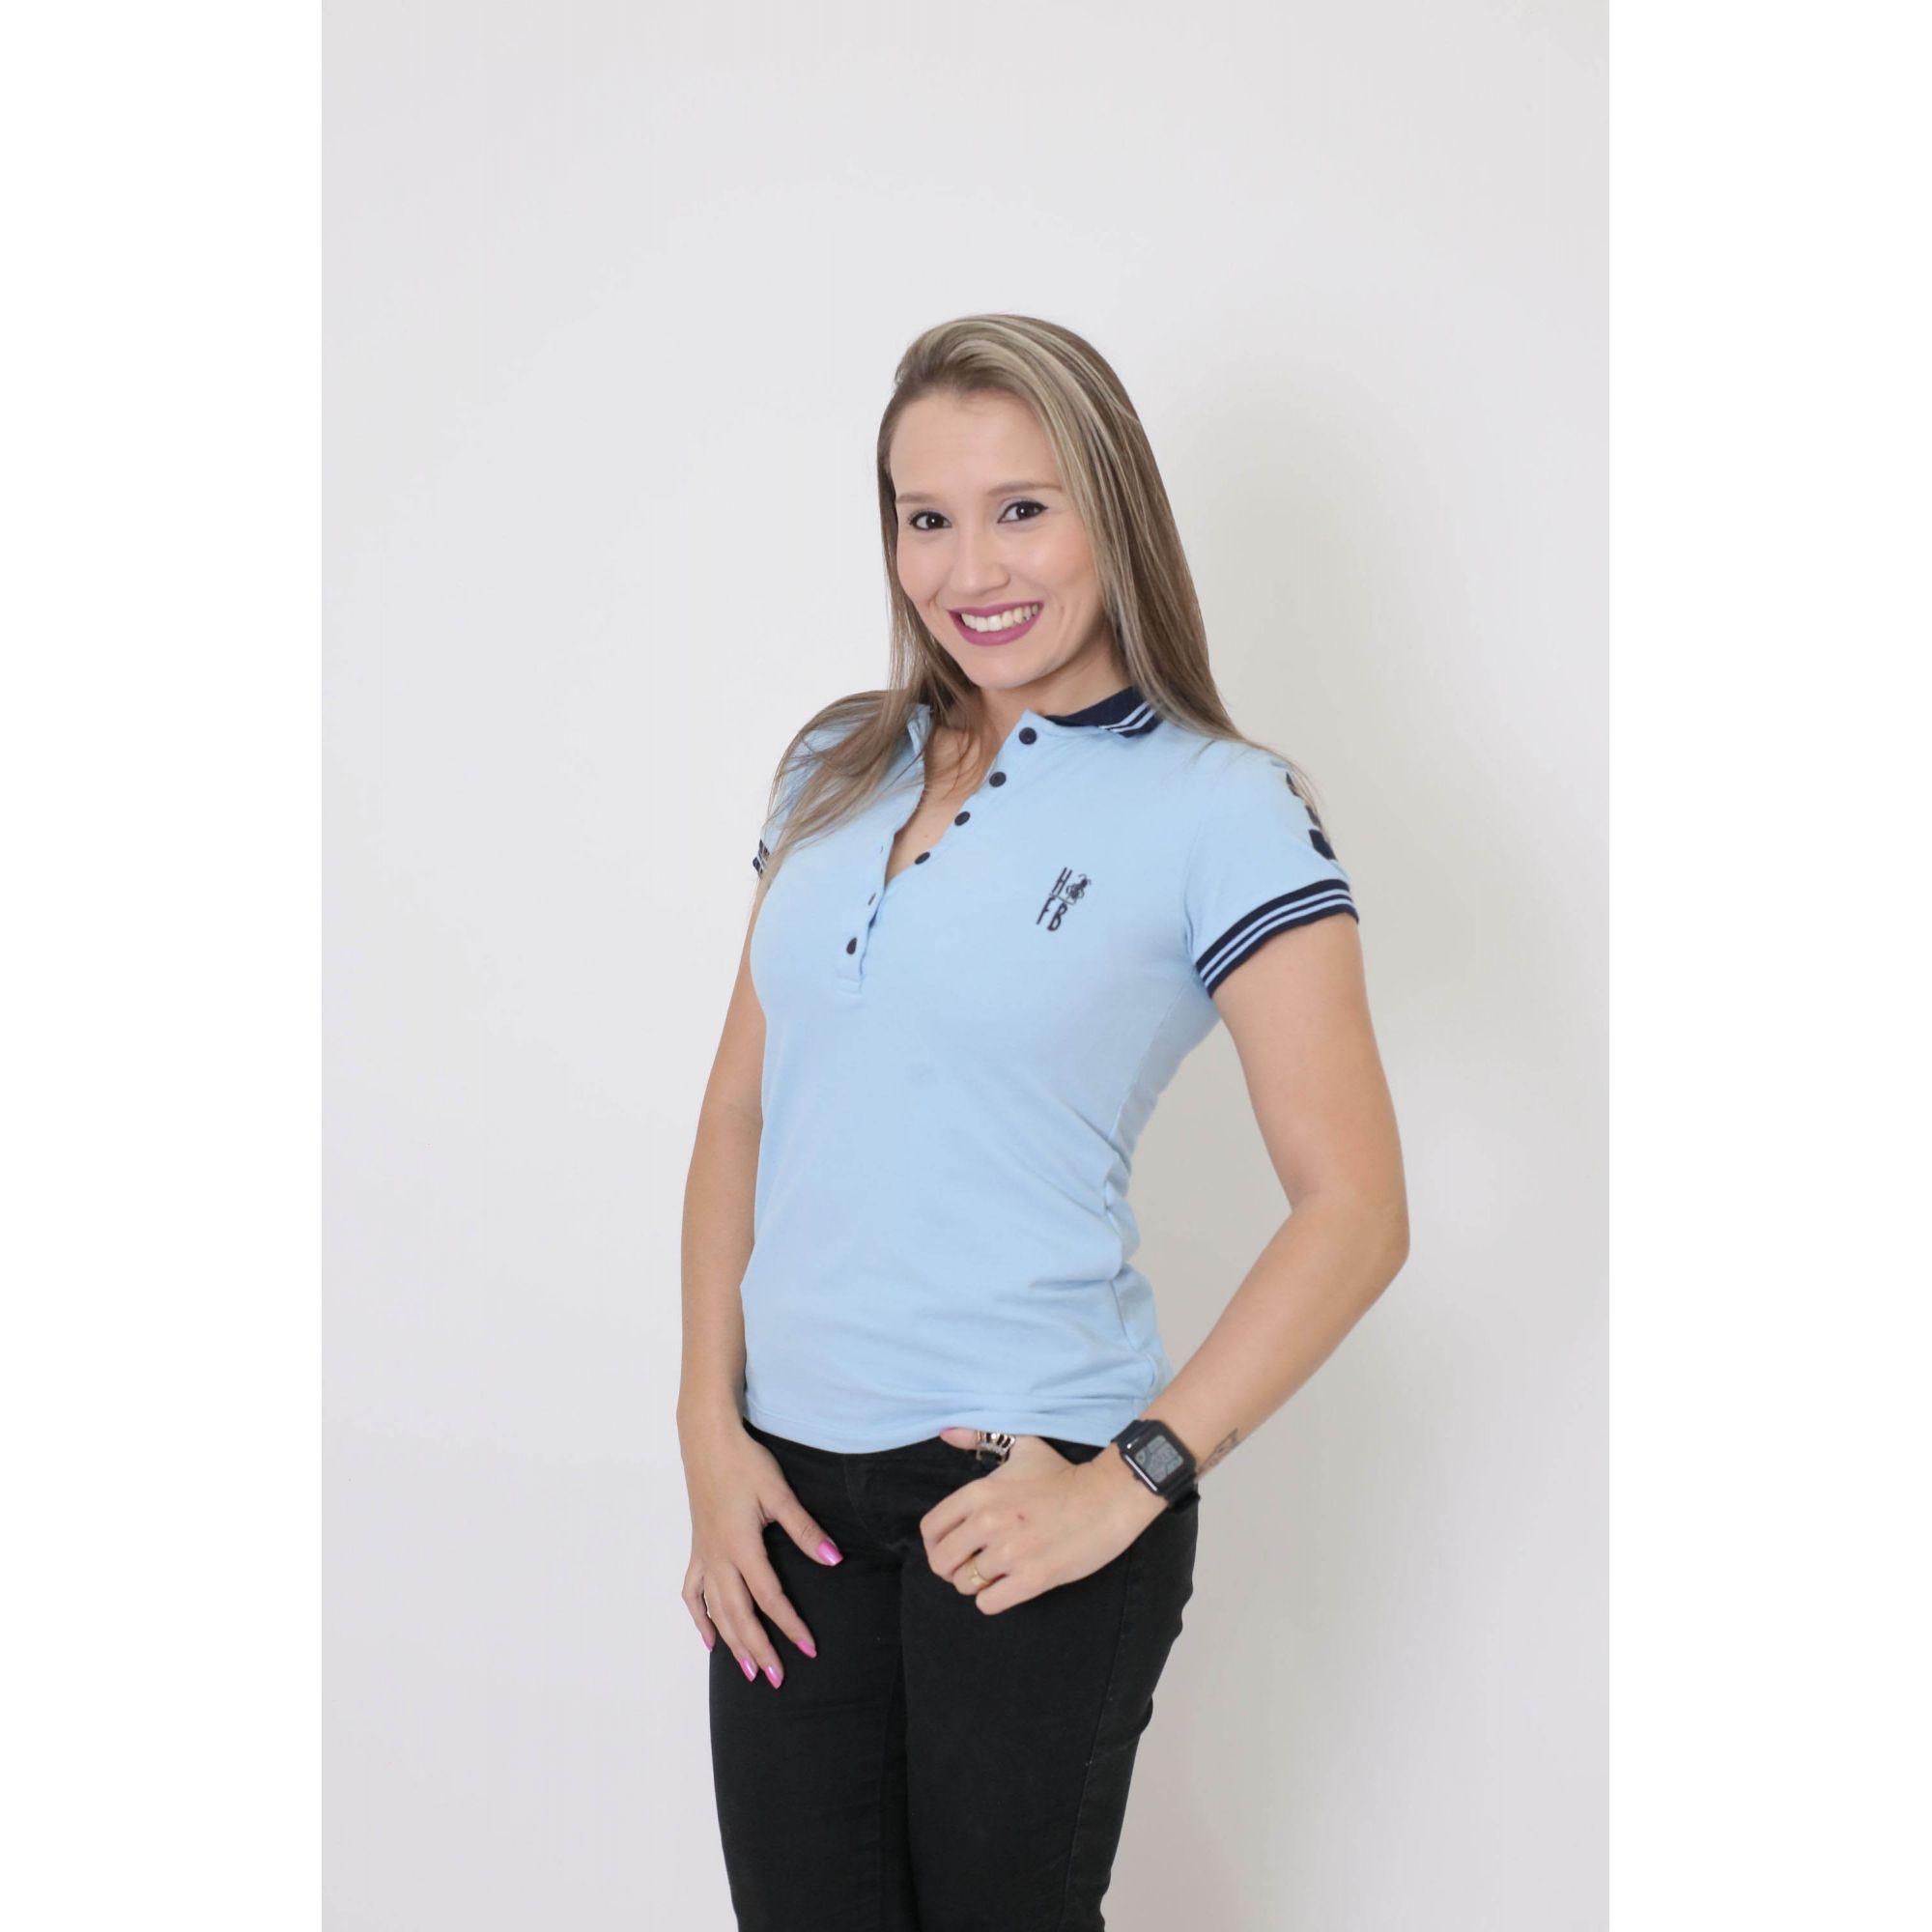 MÃE E FILHO > Kit 02 Peças - Camisa + Body Unissex Polo Azul Nobreza [Coleção Tal Mãe Tal Filho]  - Heitor Fashion Brazil